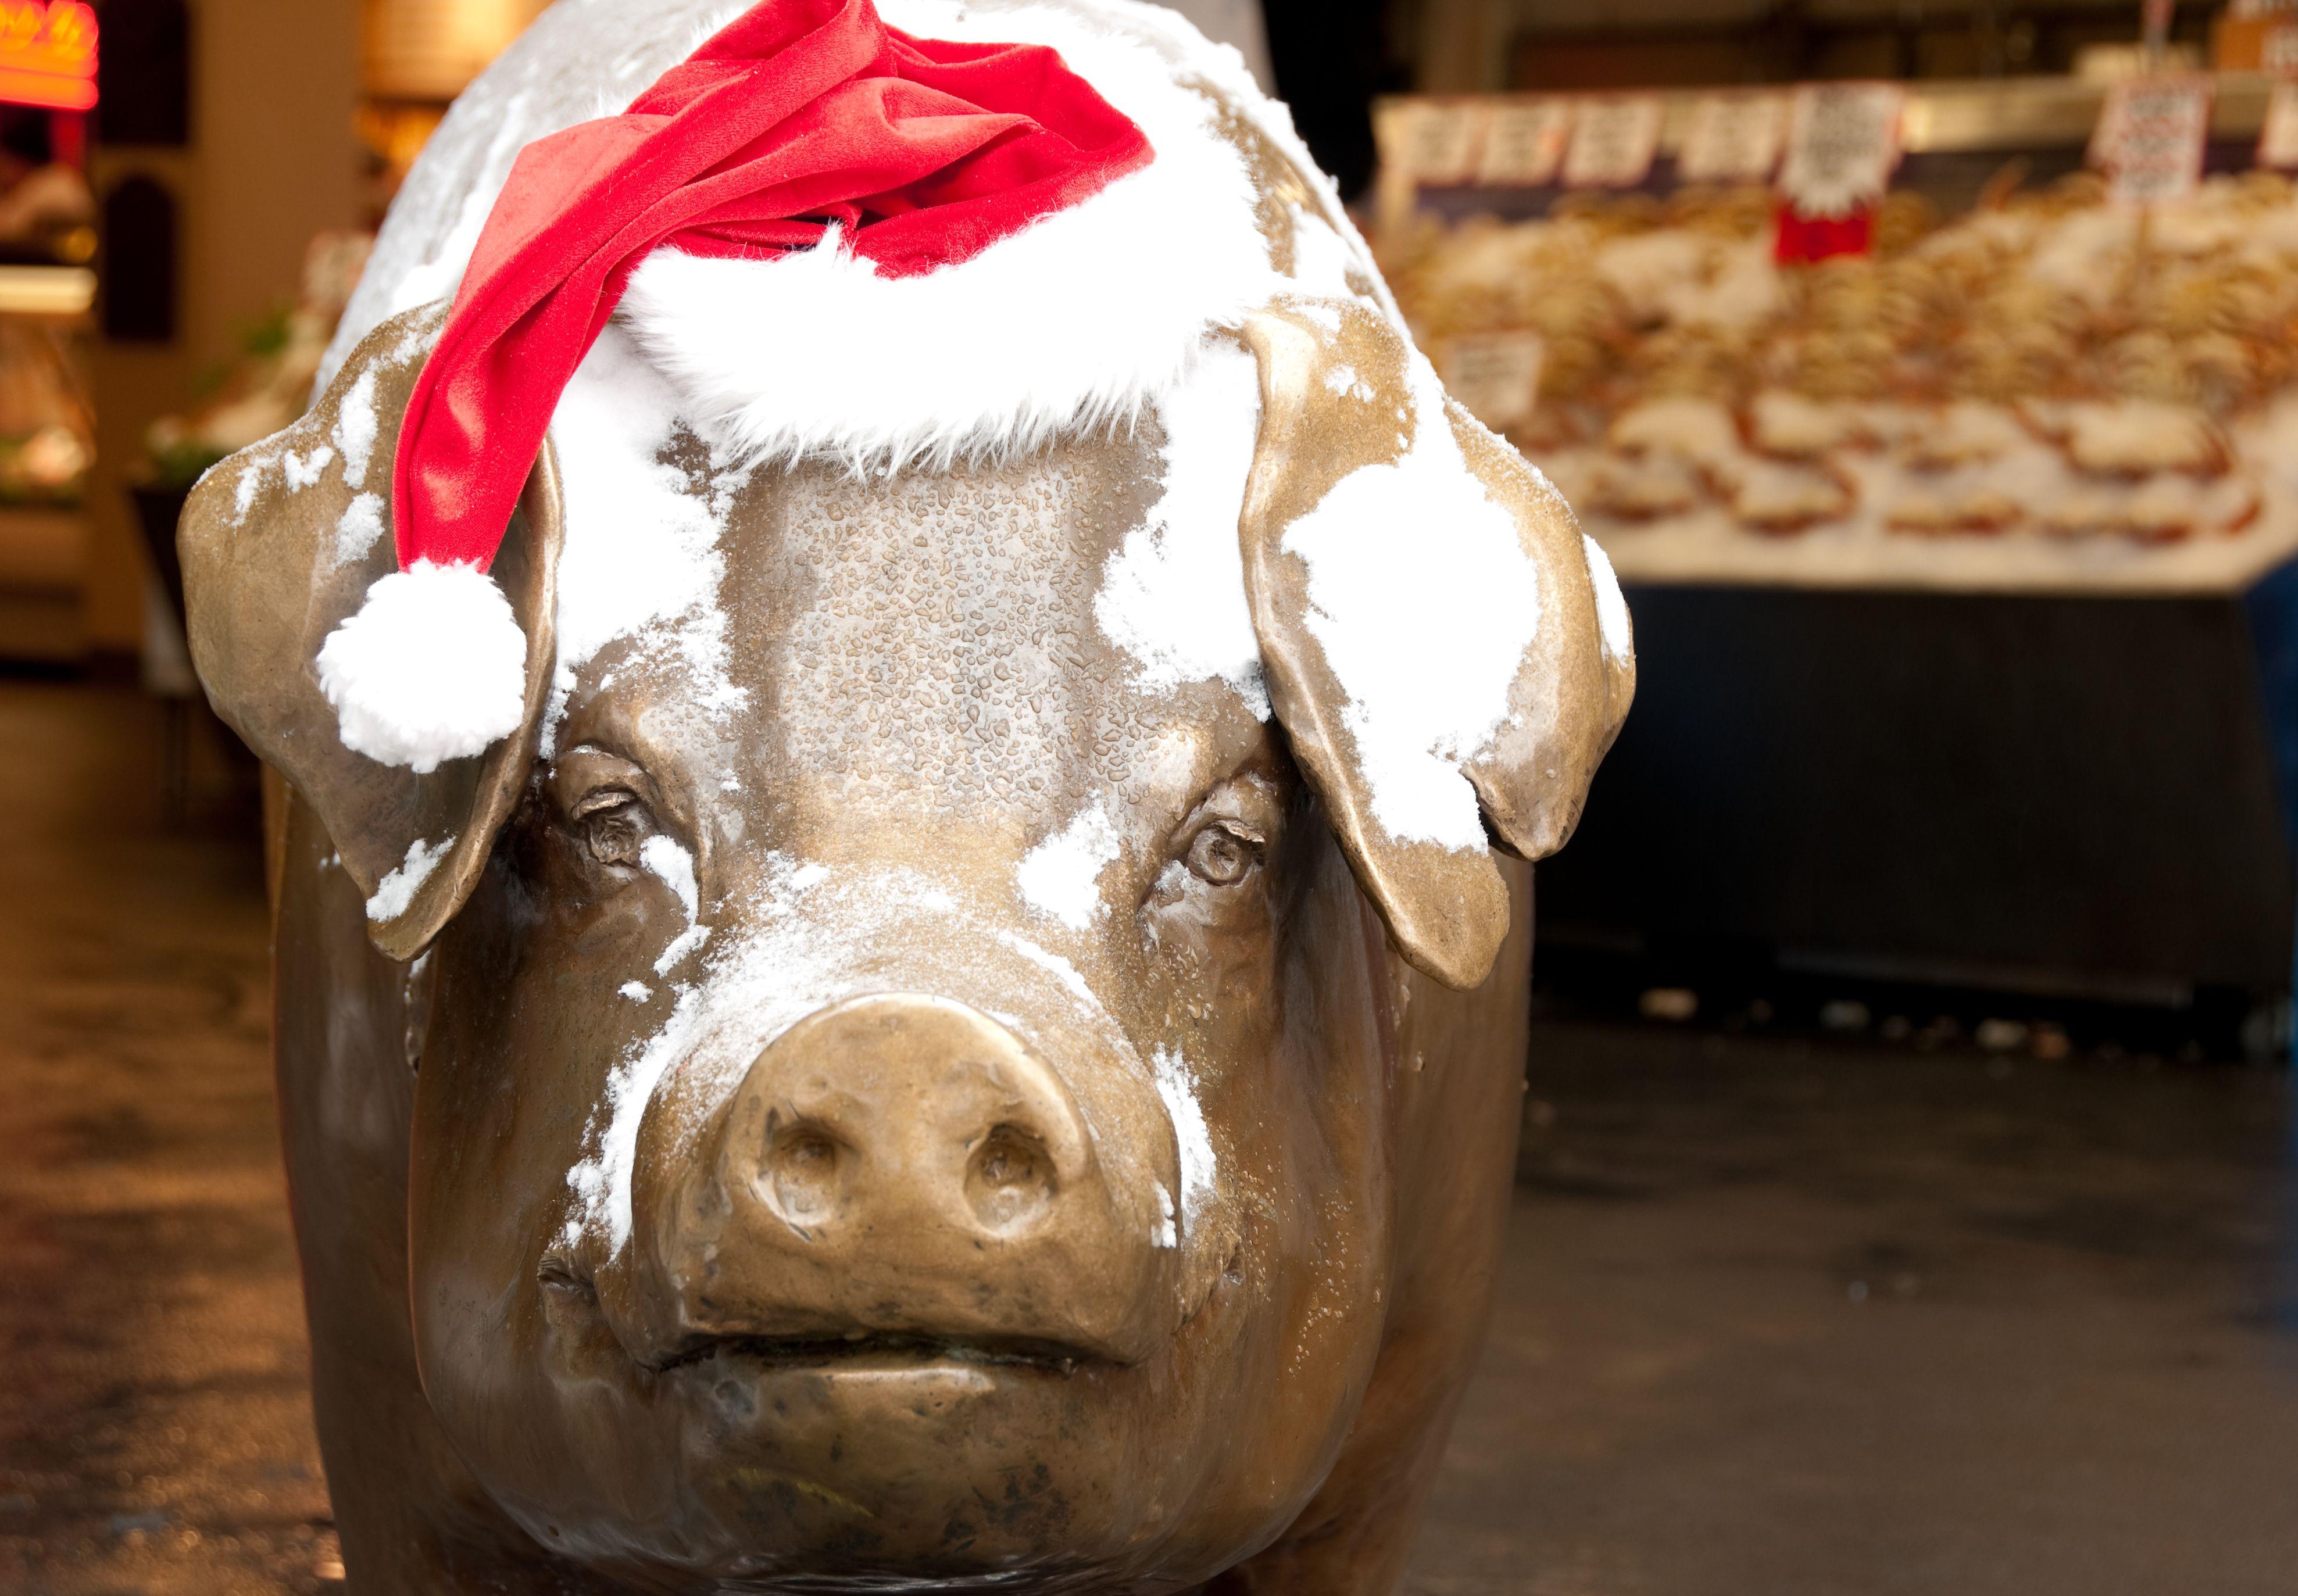 Rachel the famous Pike Place Pig